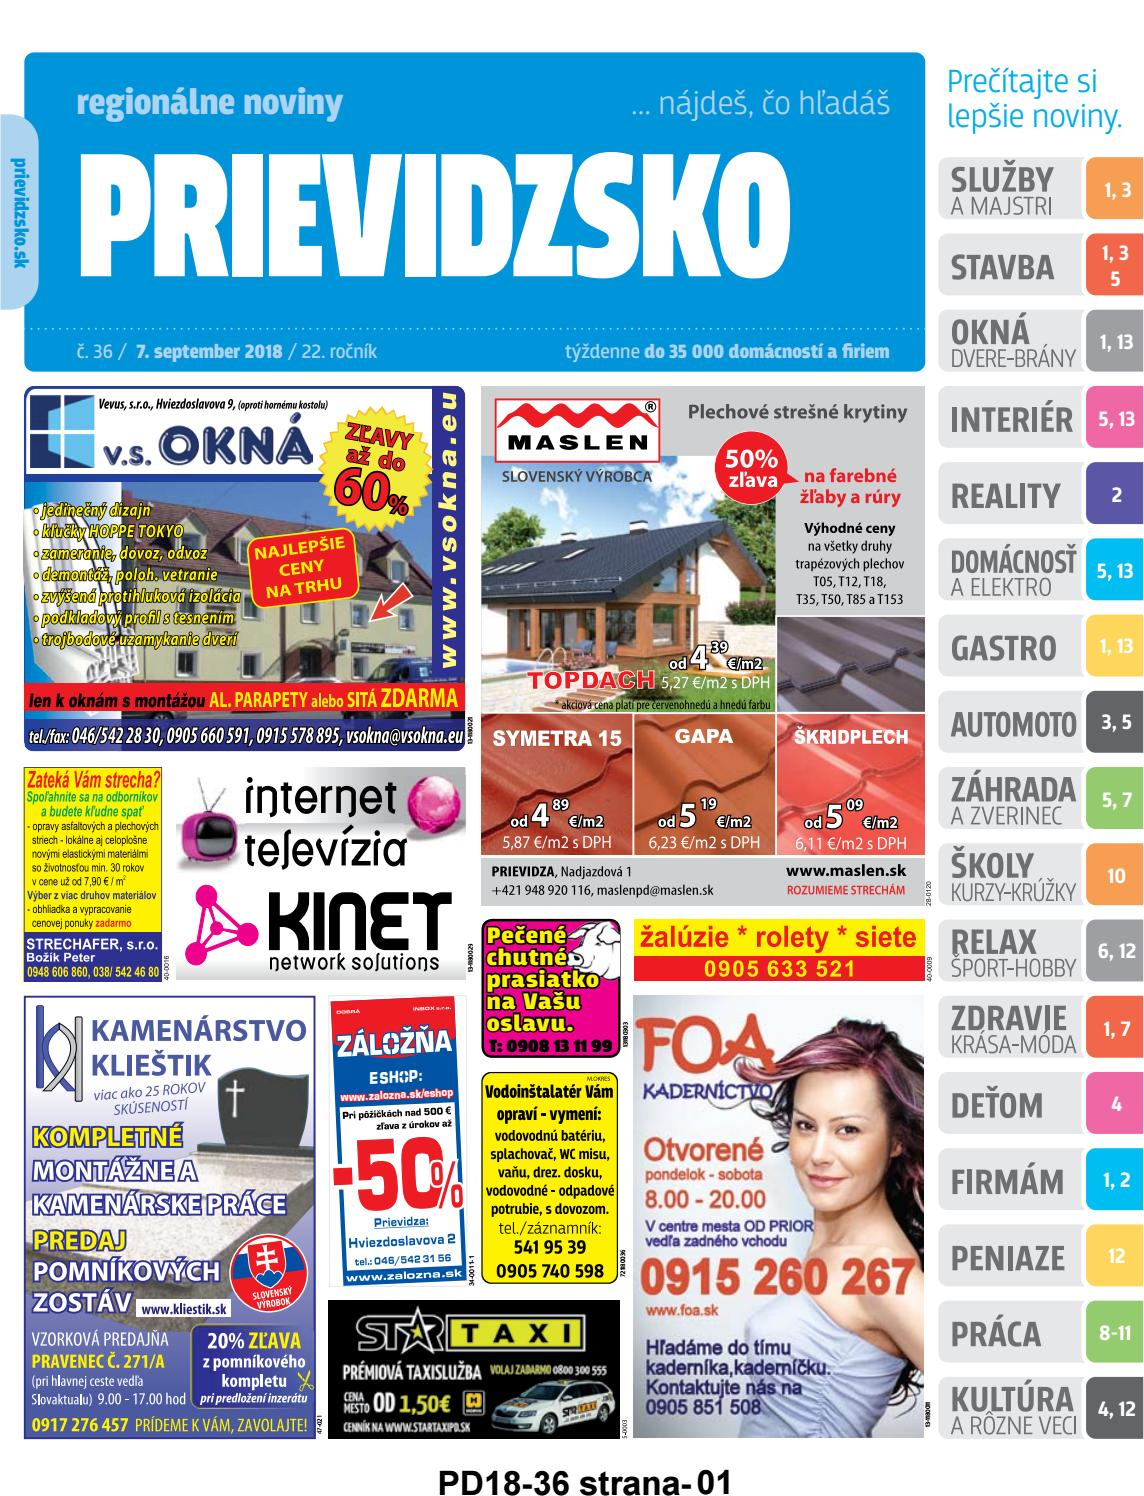 VT Zoznamka demo